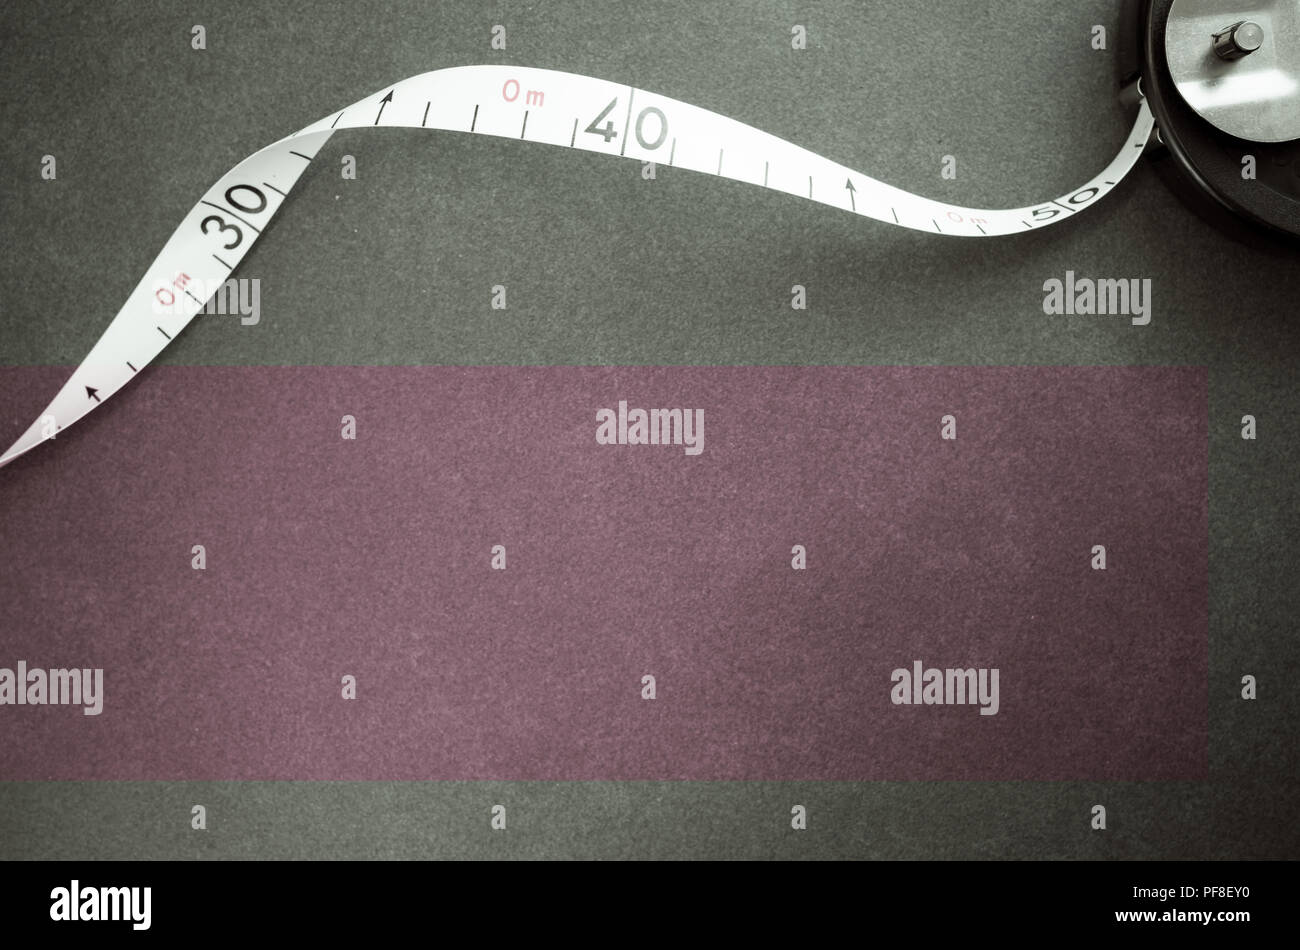 industrial metric measuring tape on a dark worktop surface - top view - Stock Image